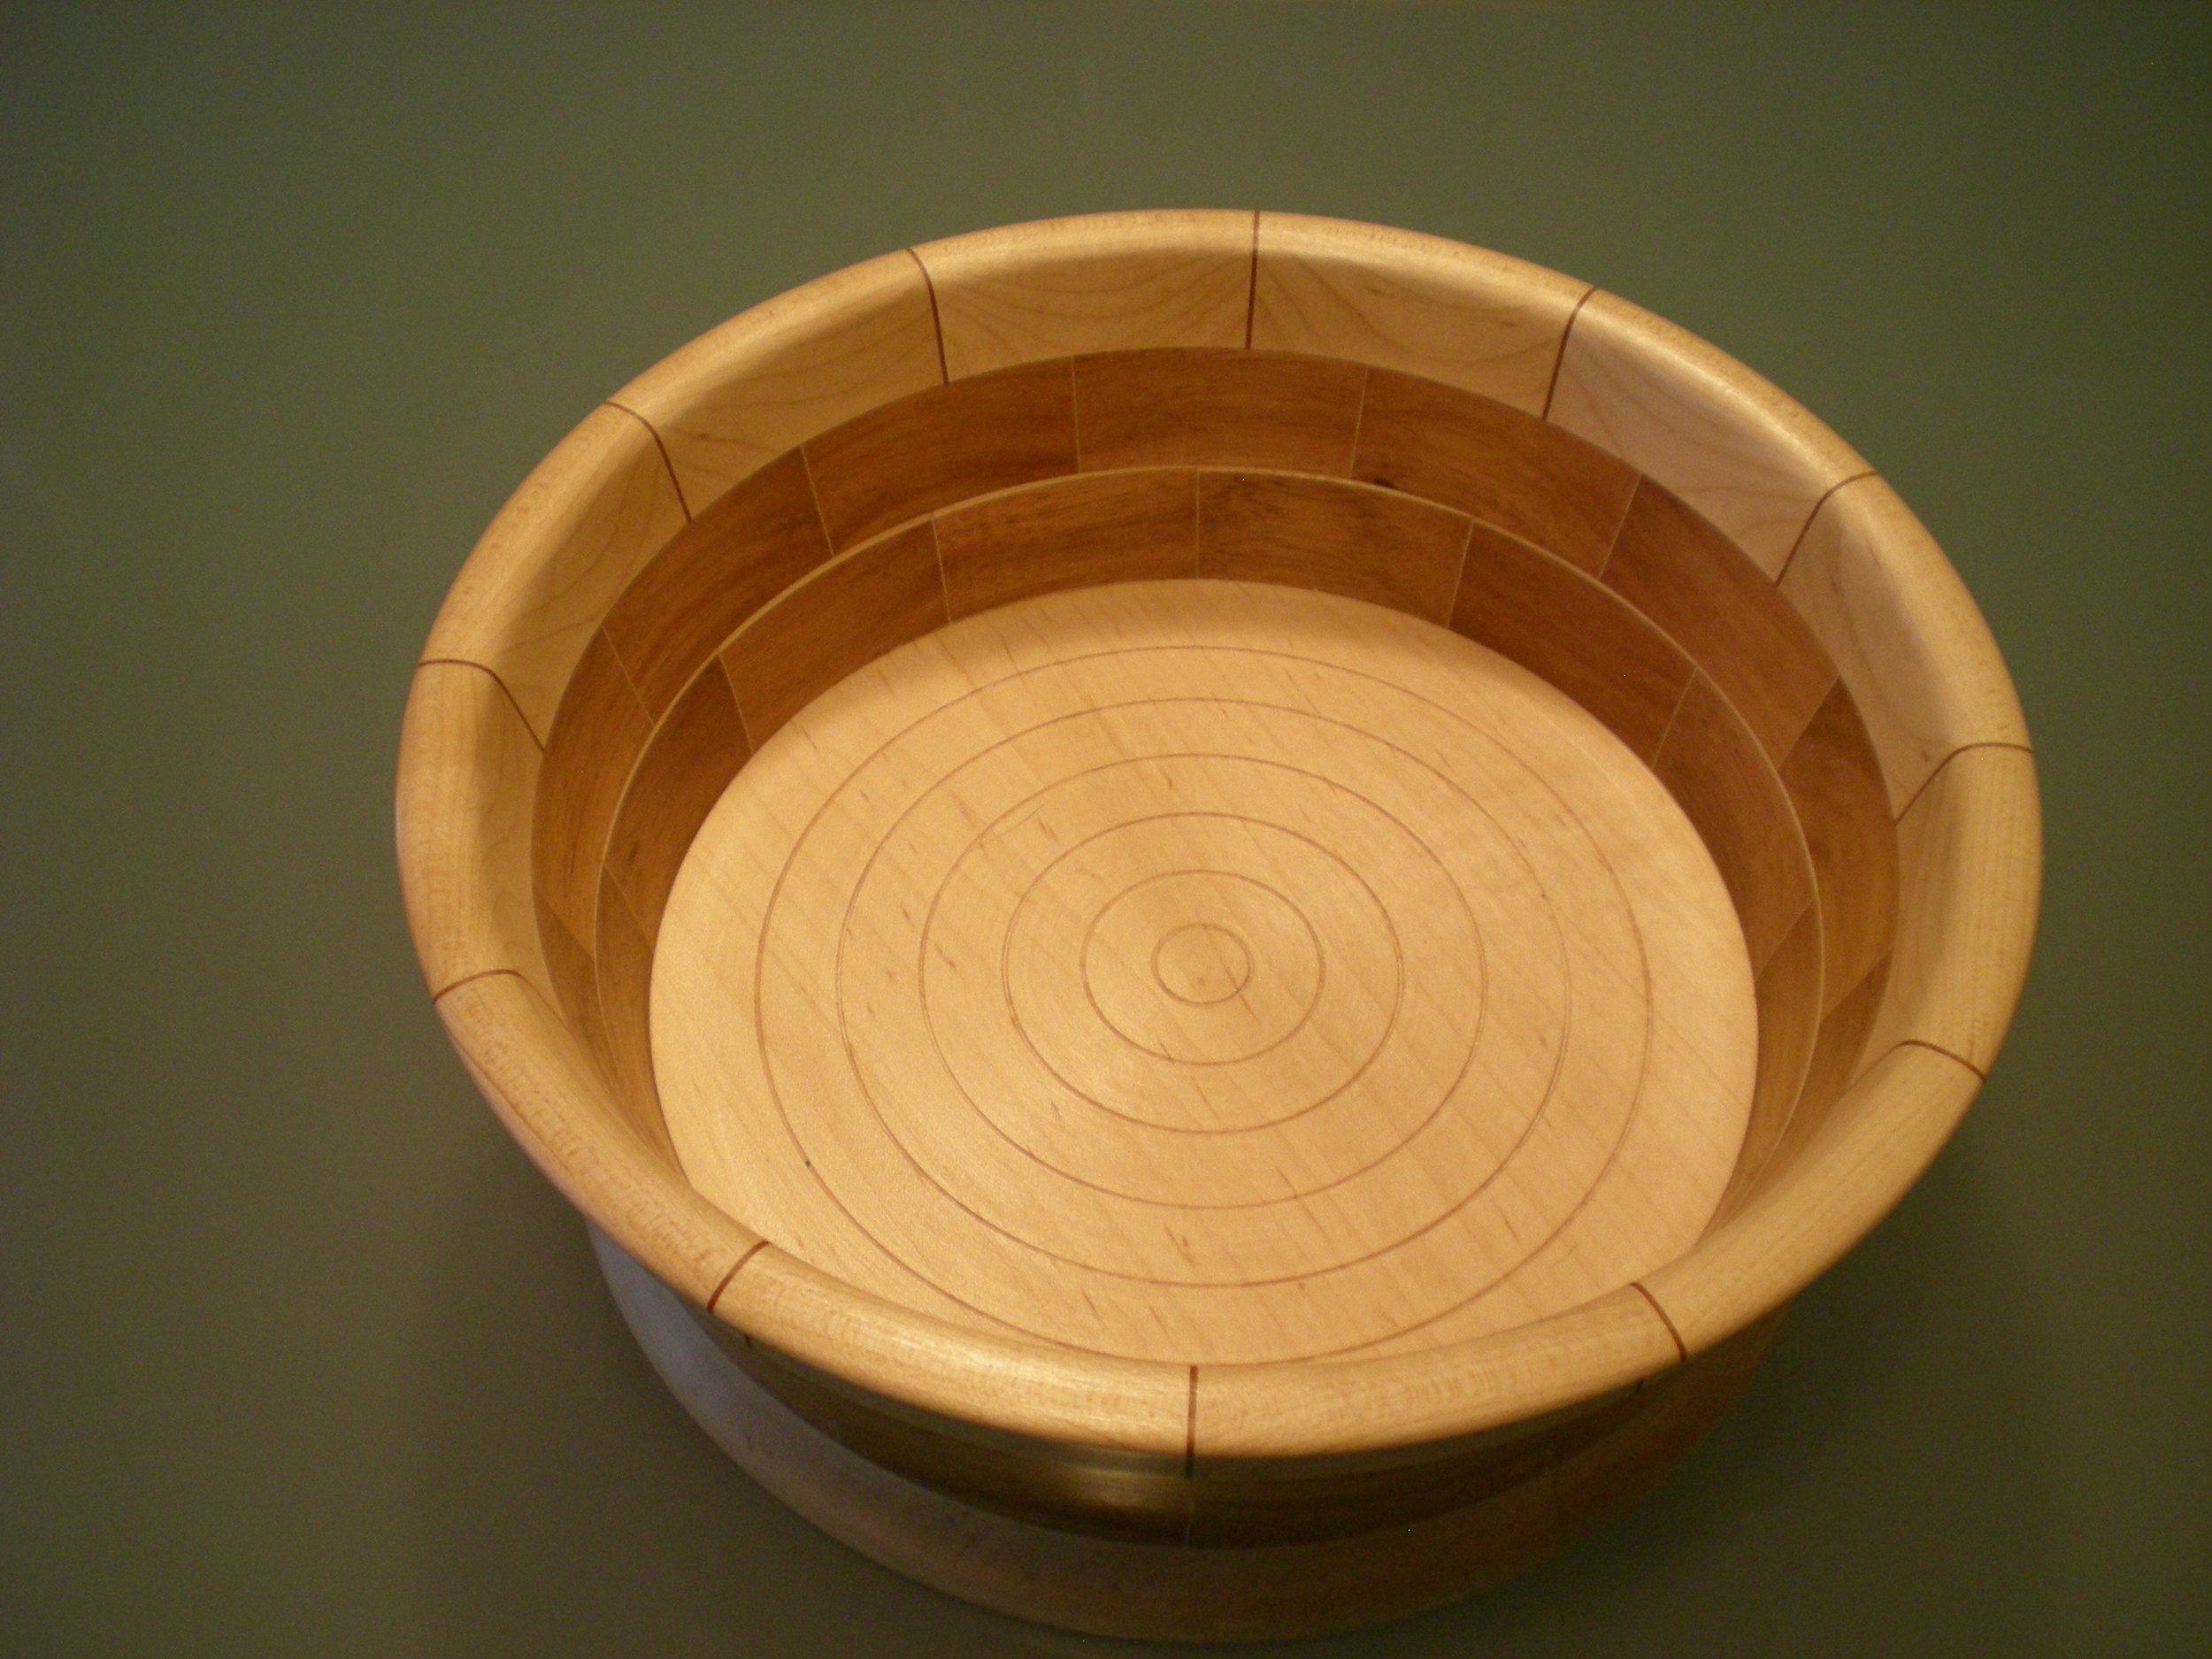 RJC Wood Creations - Bowls (40).JPG